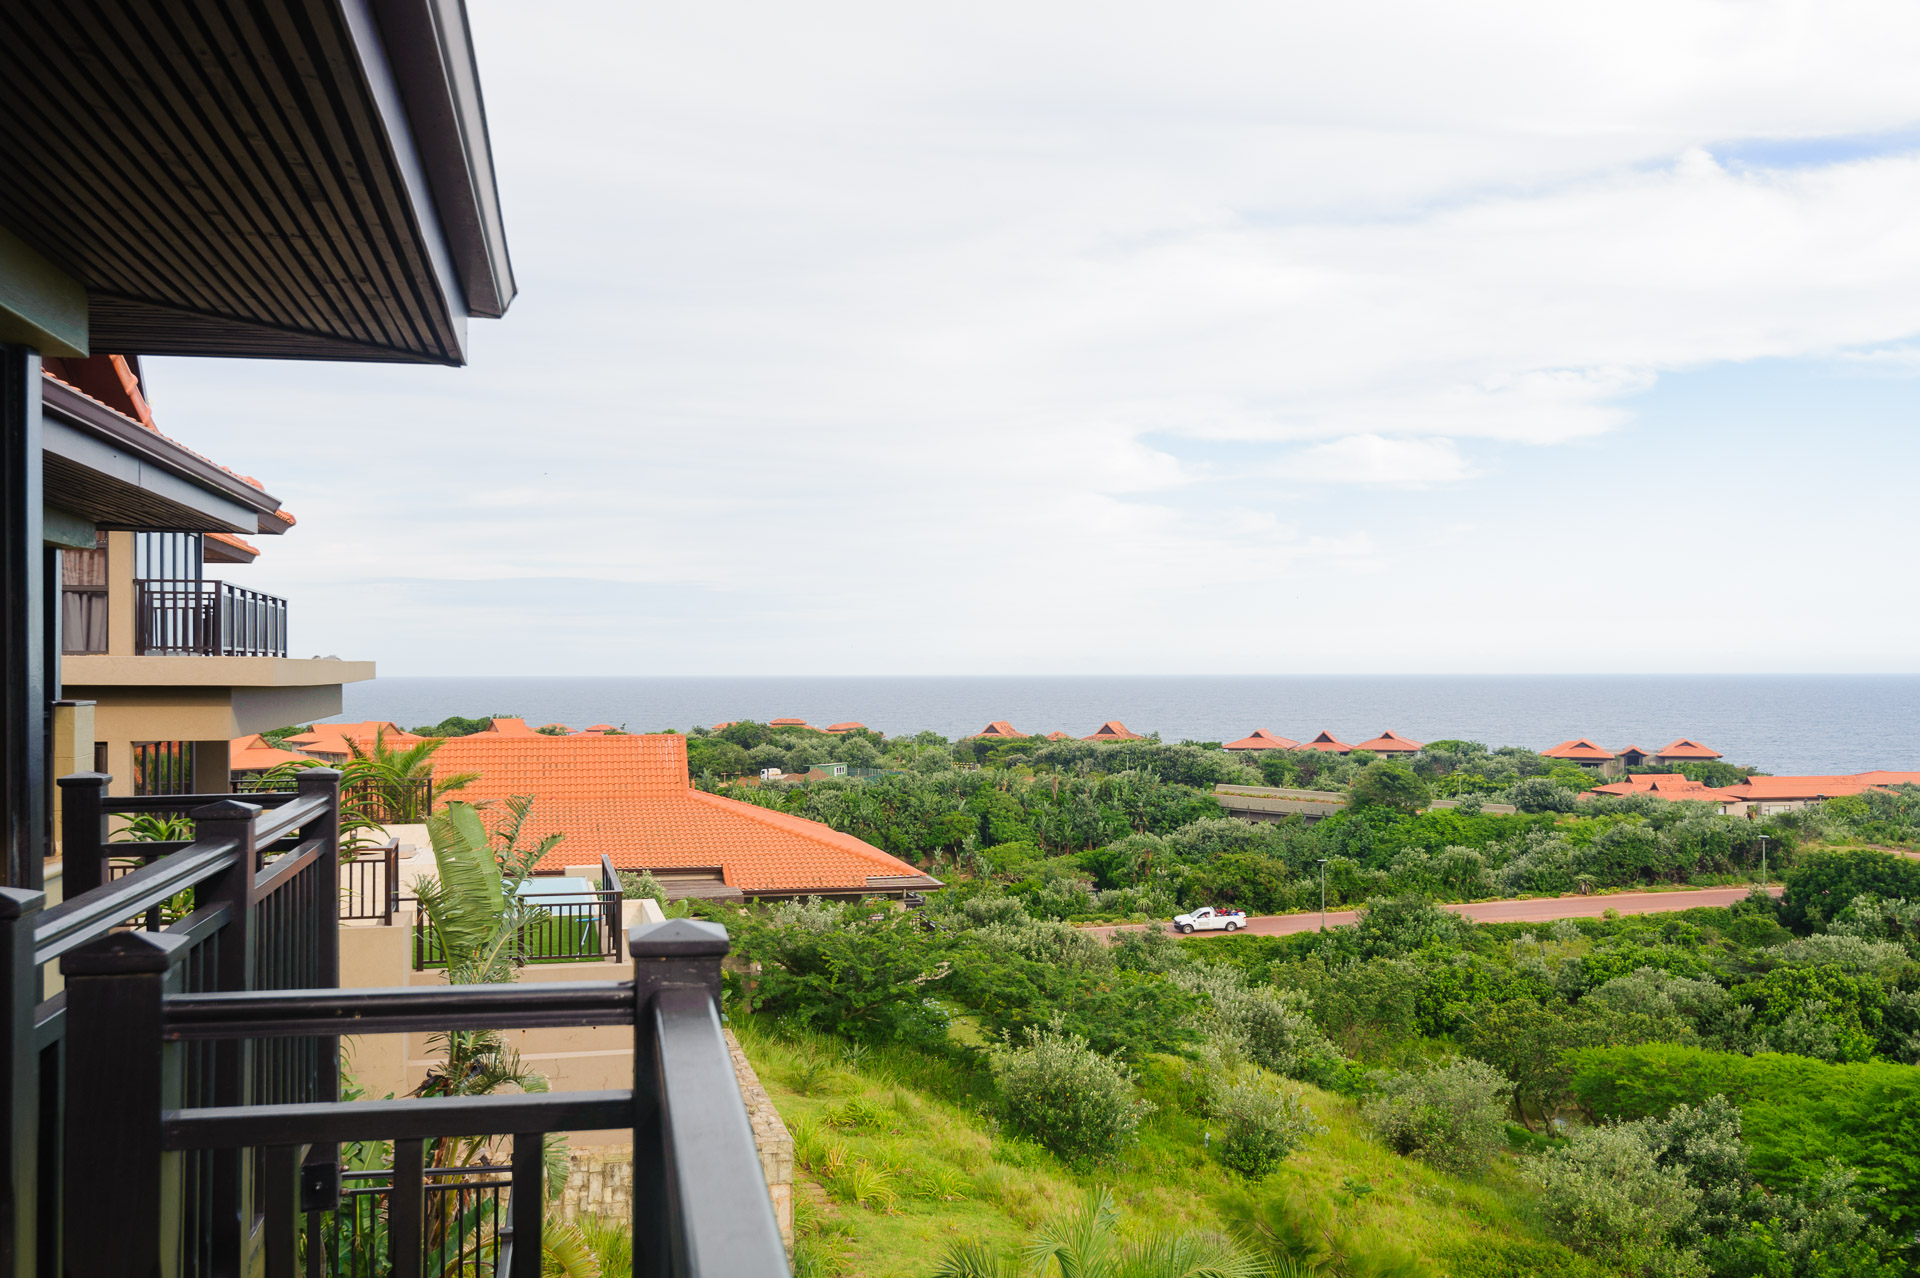 5 BedroomHouse For Sale In Zimbali Coastal Resort & Estate